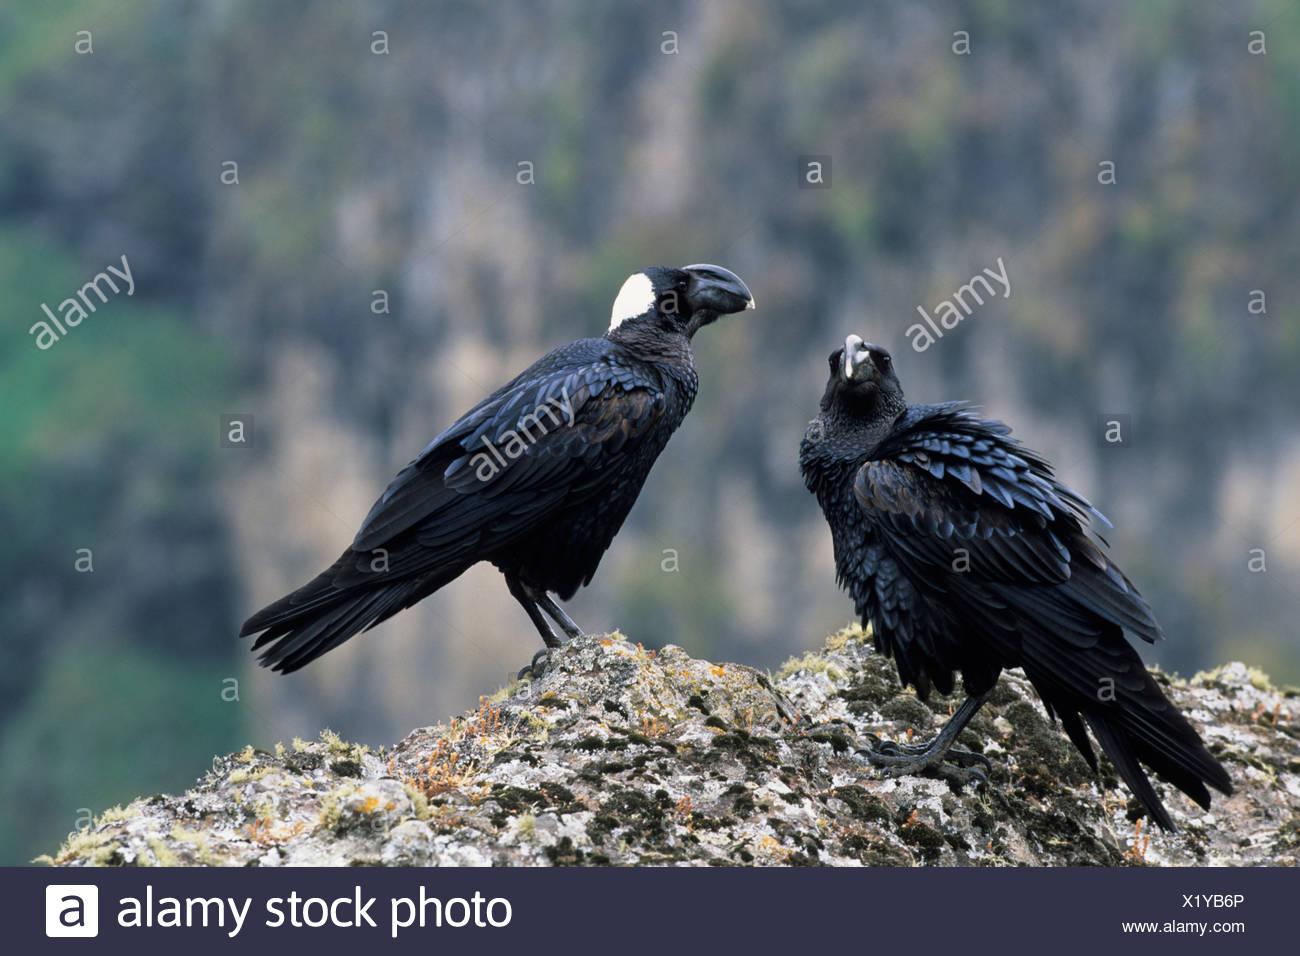 thick-billed raven (Corvus crassirostris), couple, Ethiopia, Simien Mountains National Park - Stock Image